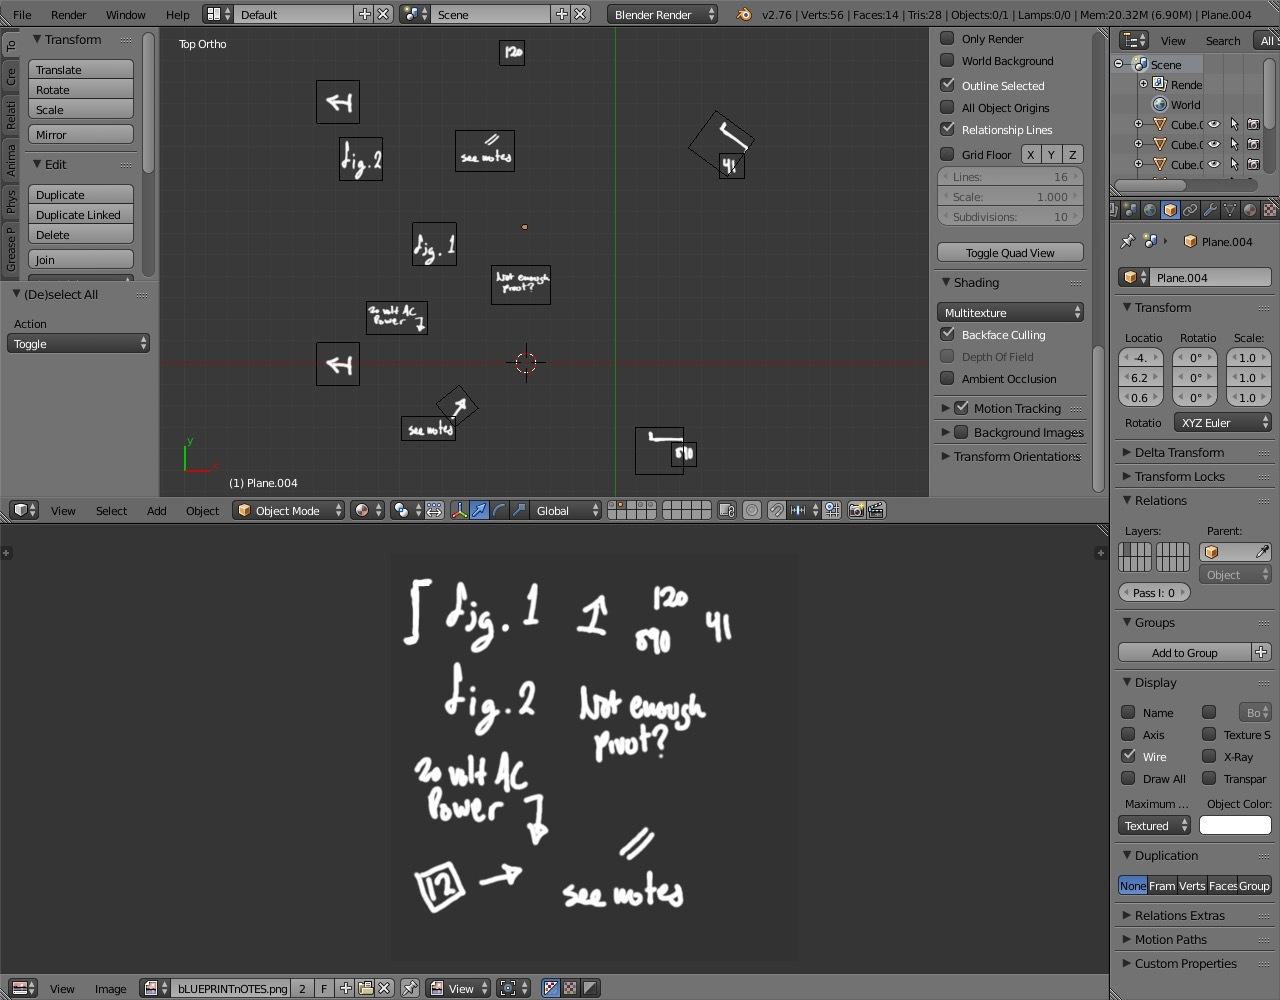 Tutorial creating 3d blueprints sketchfab blog fig 5 transparent annotations in scene malvernweather Images